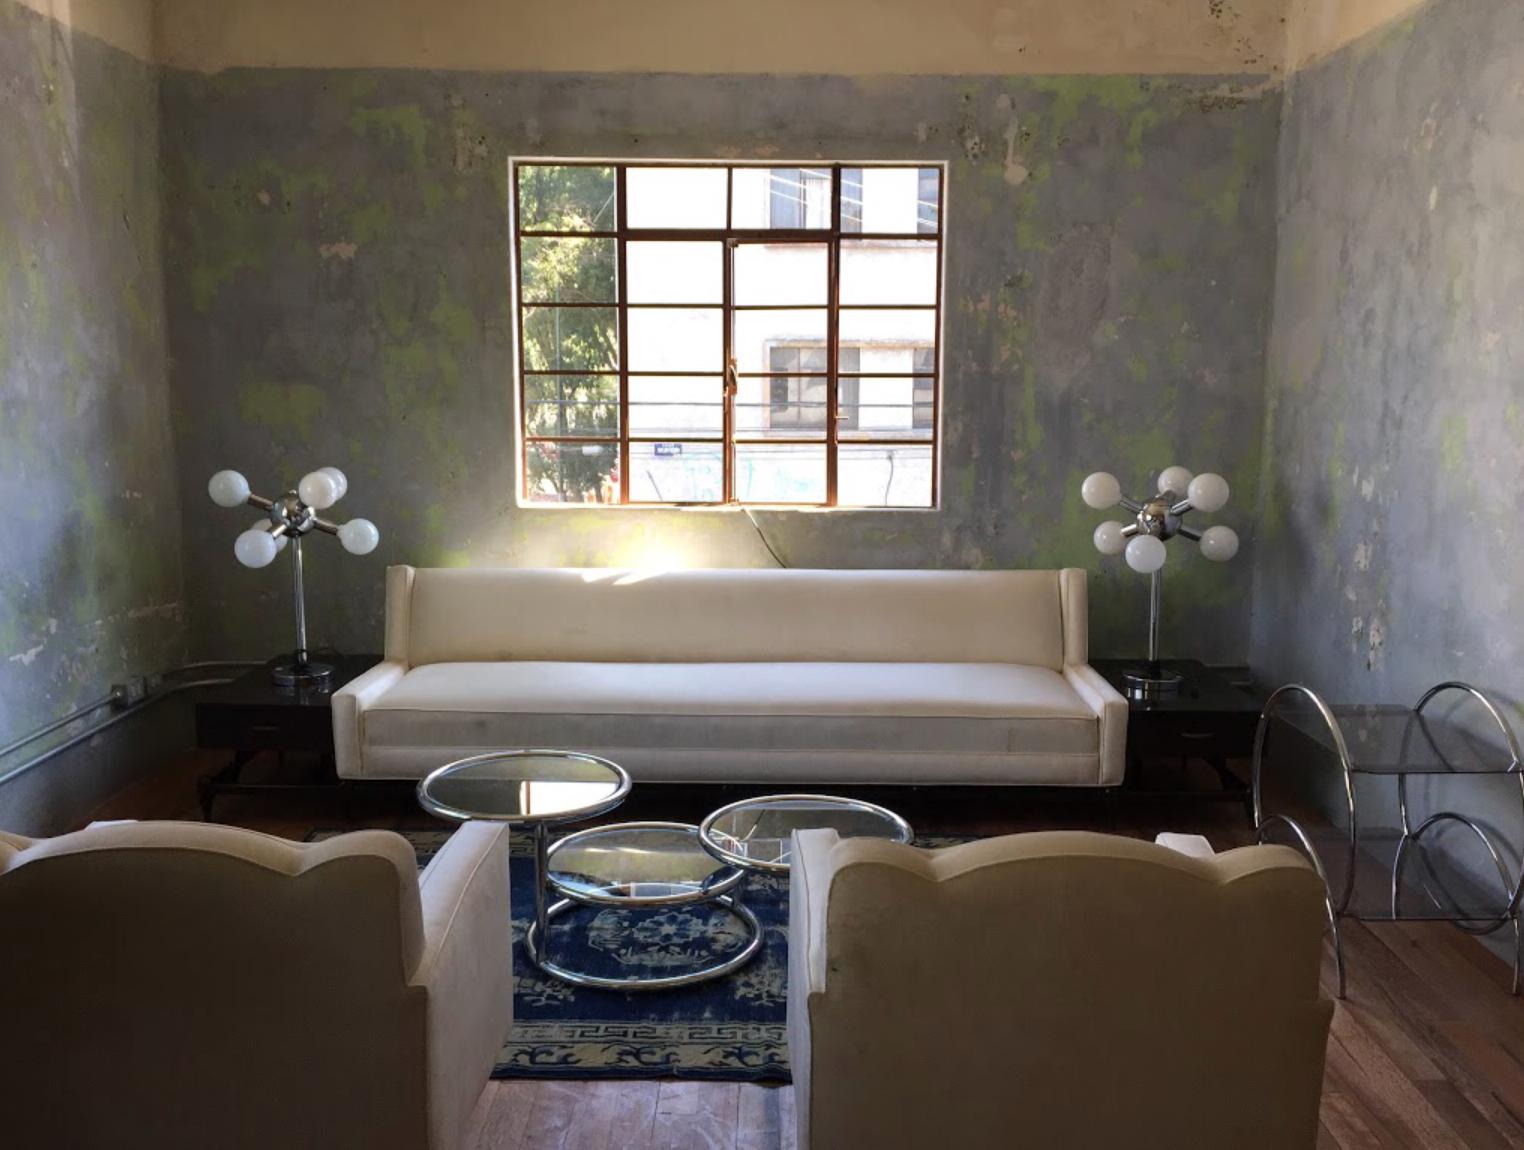 Decada Is A Vintage Furniture Store At The Santa Maria La Ribera Inmexico